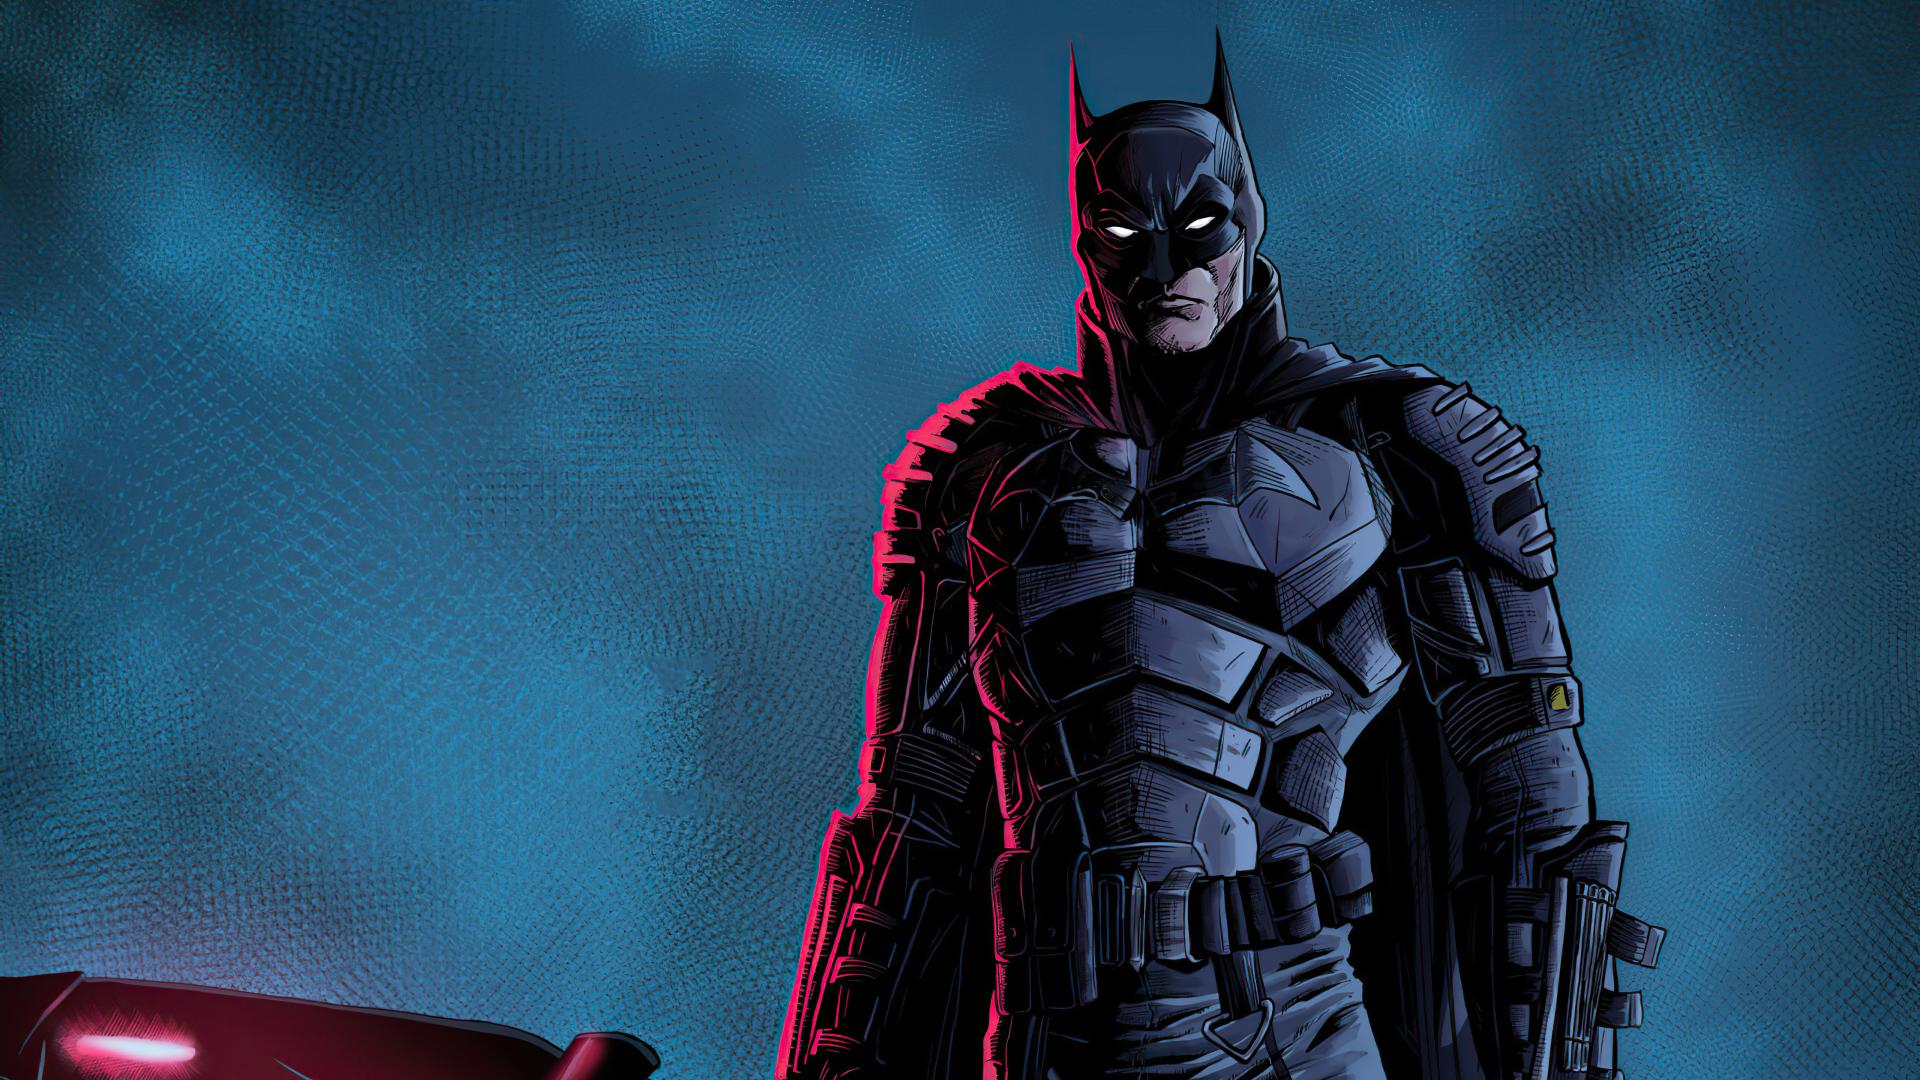 1920x1080 New Batman Illustration 2020 1080P Laptop Full ...